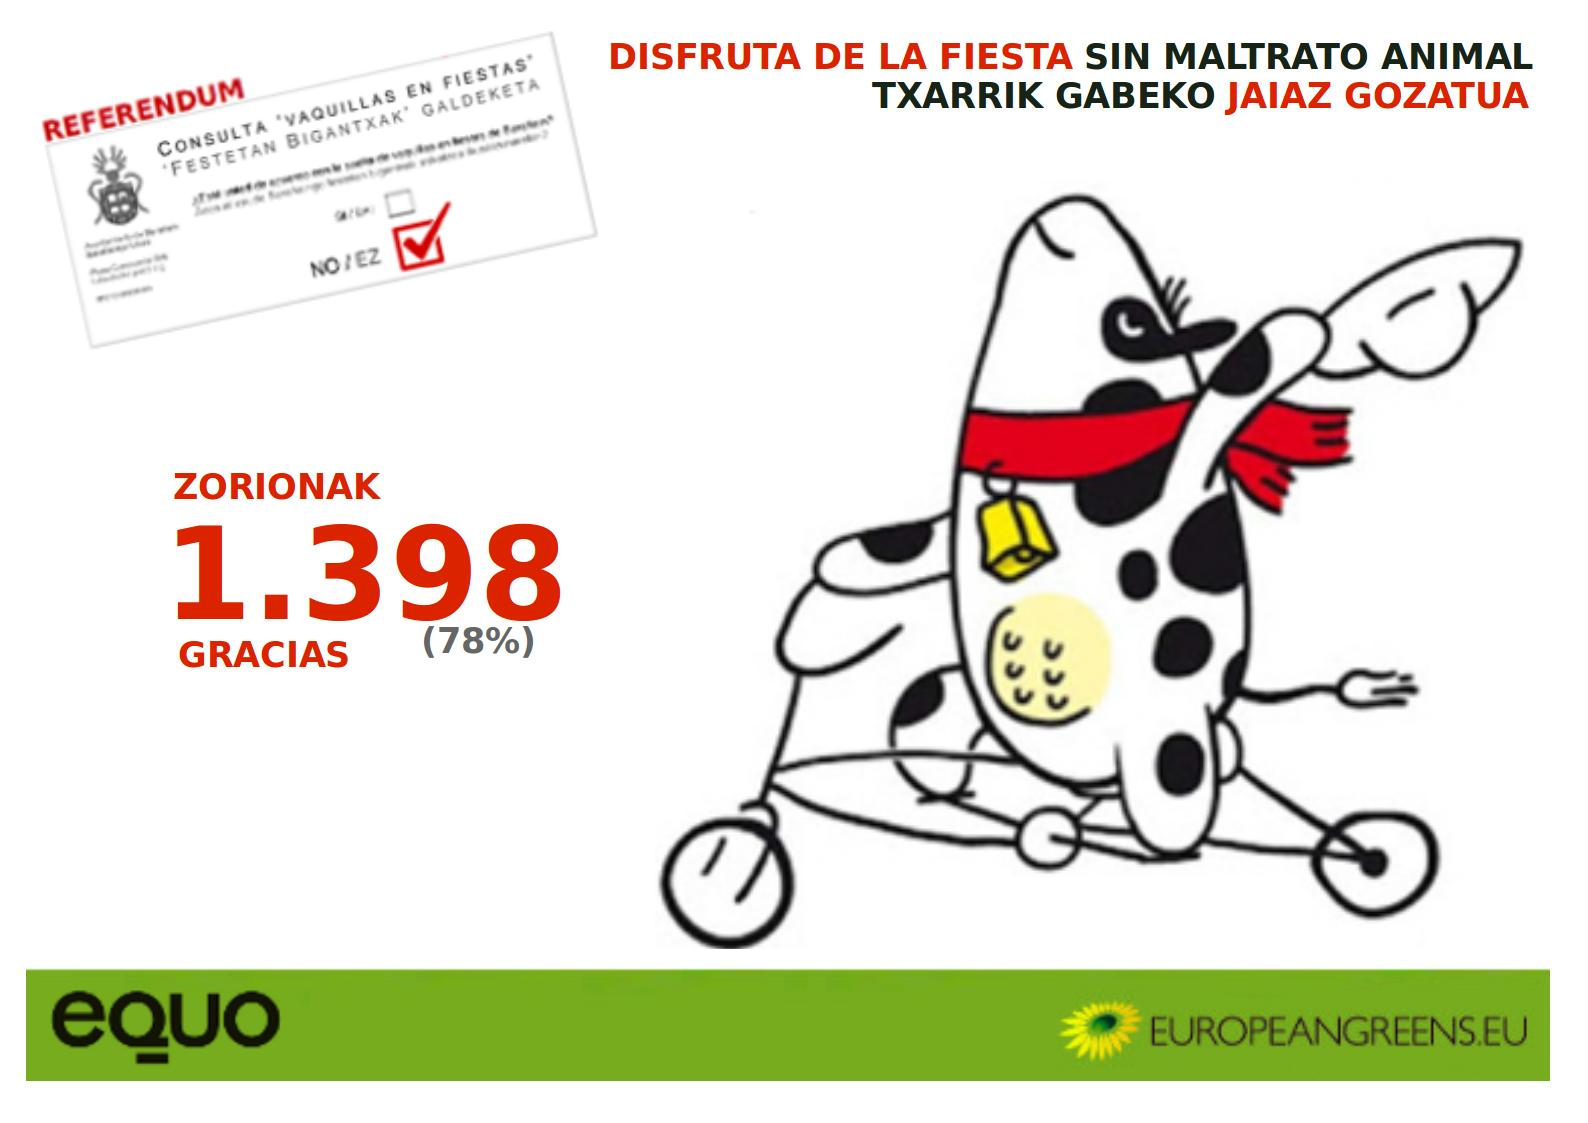 IEEQUO_Barañain_Referendum_Gracias